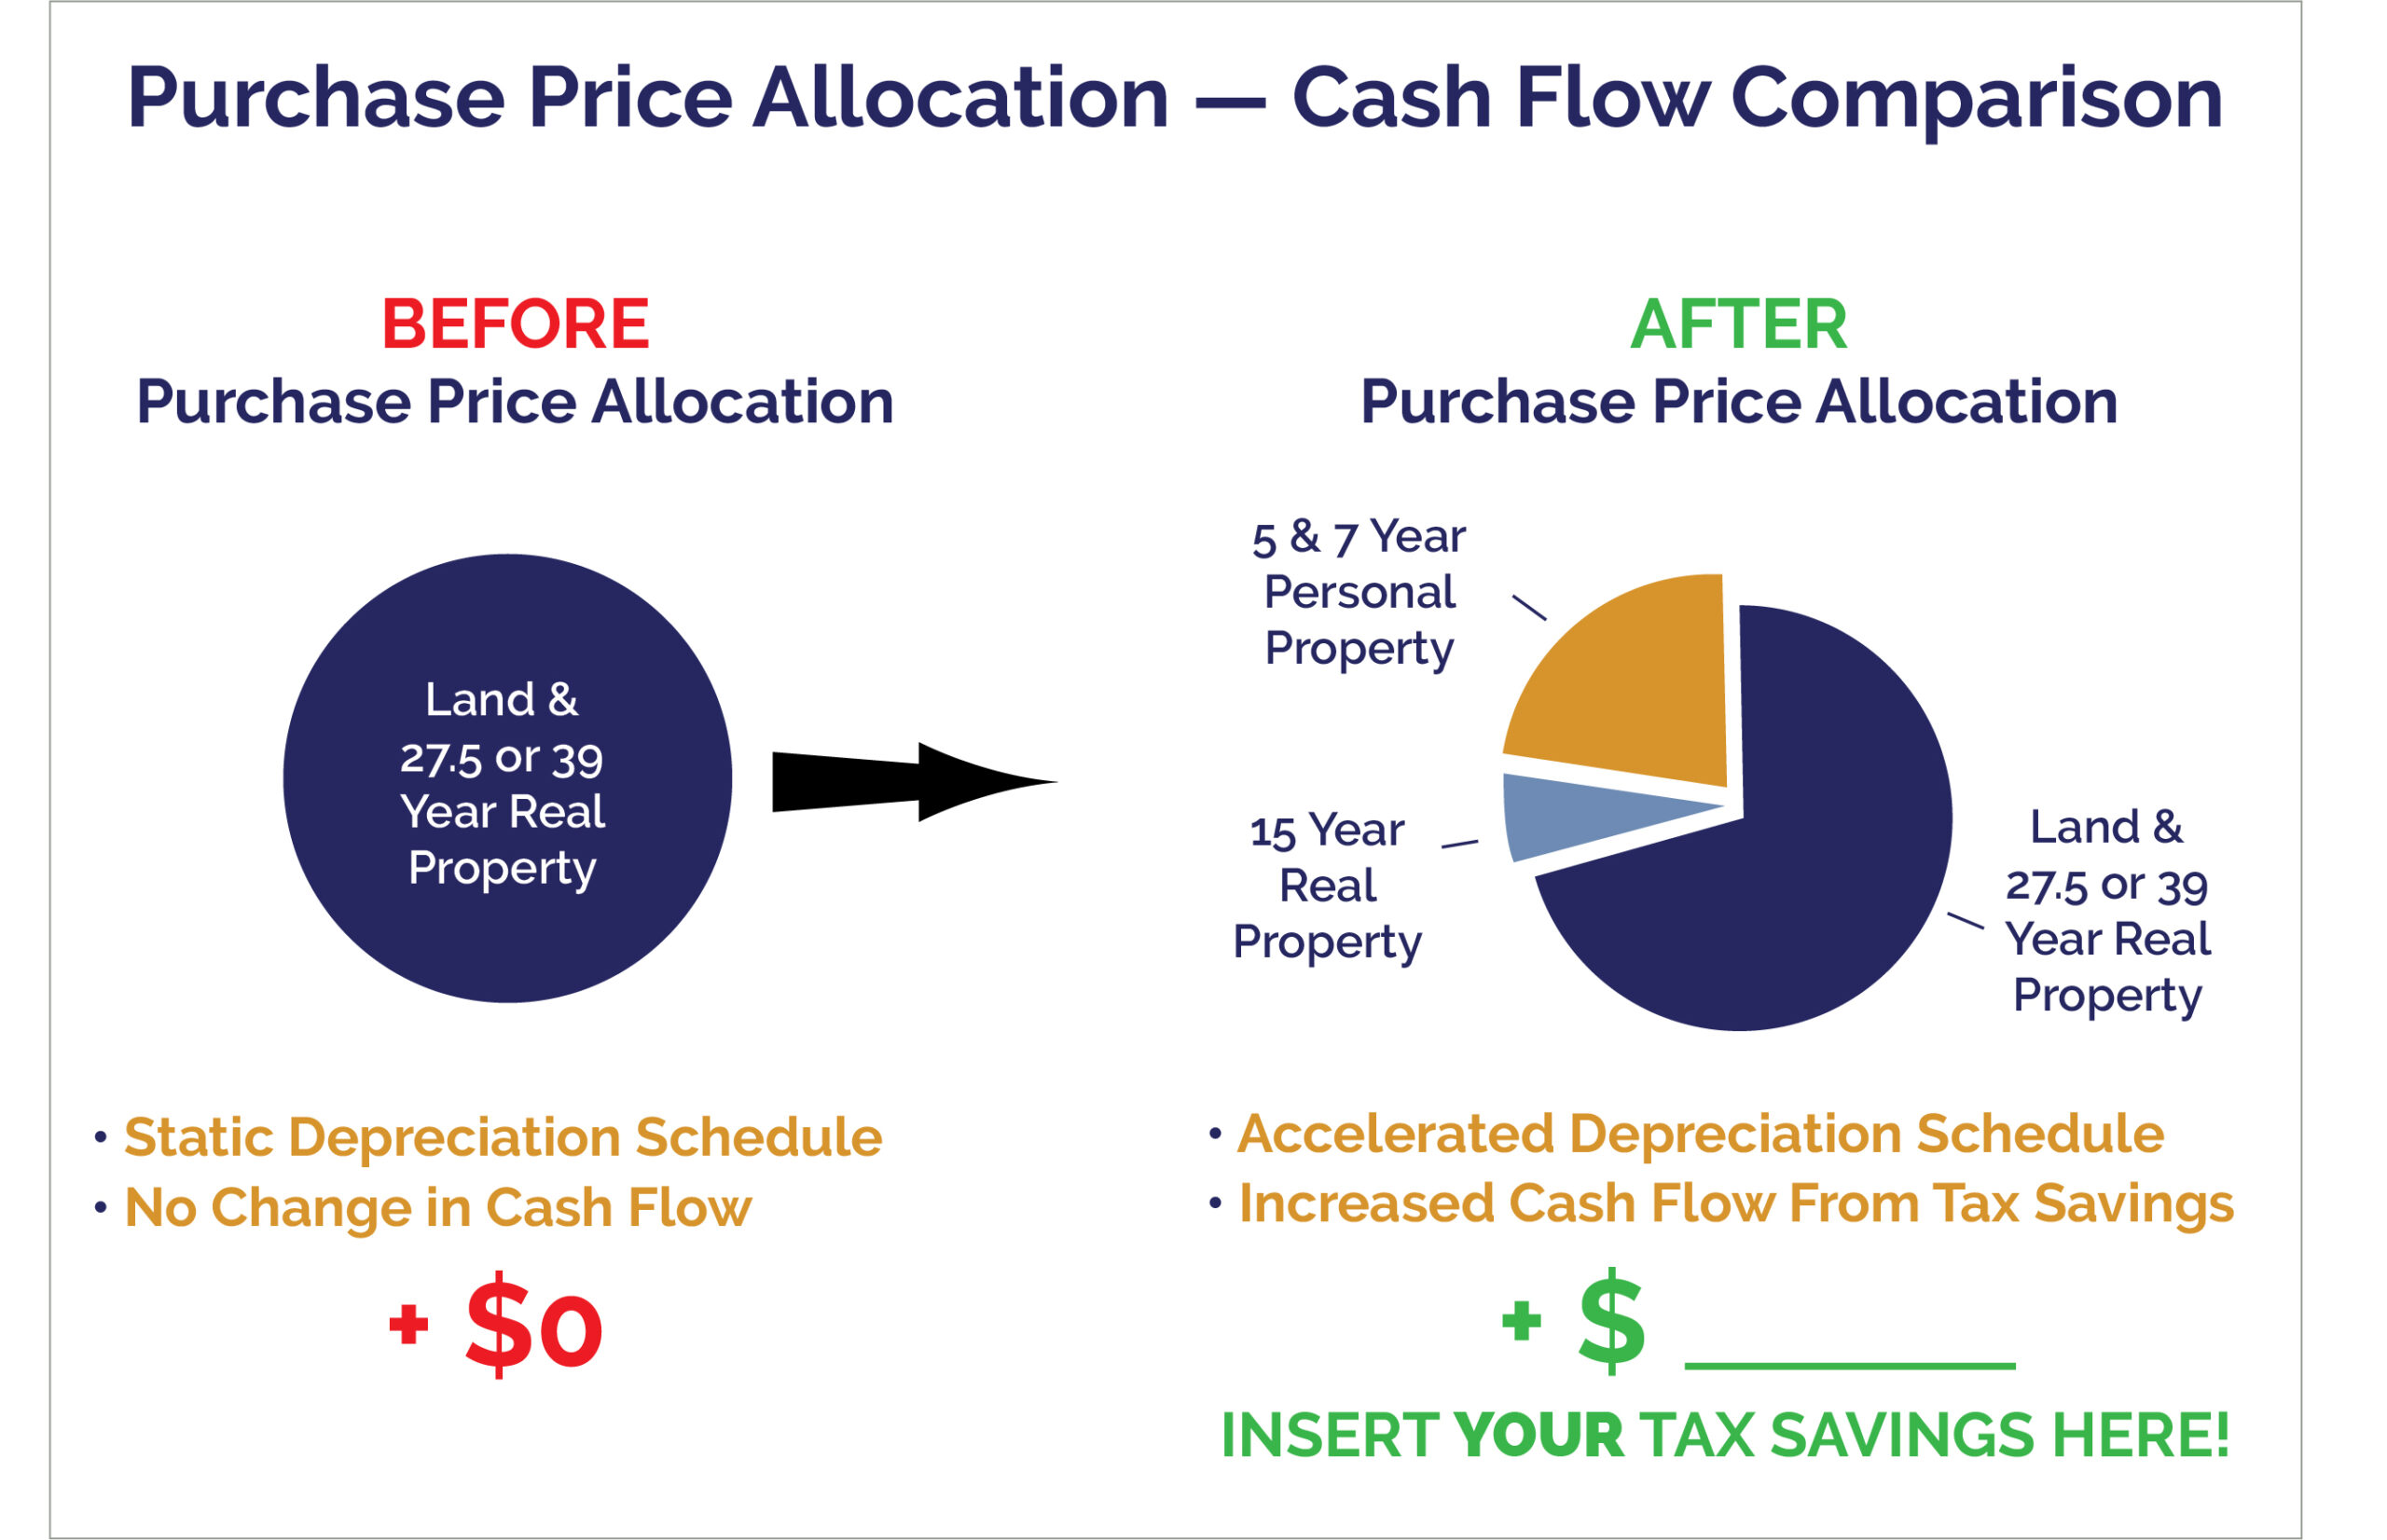 Purchase Price Allocation Cash Flow Comparison